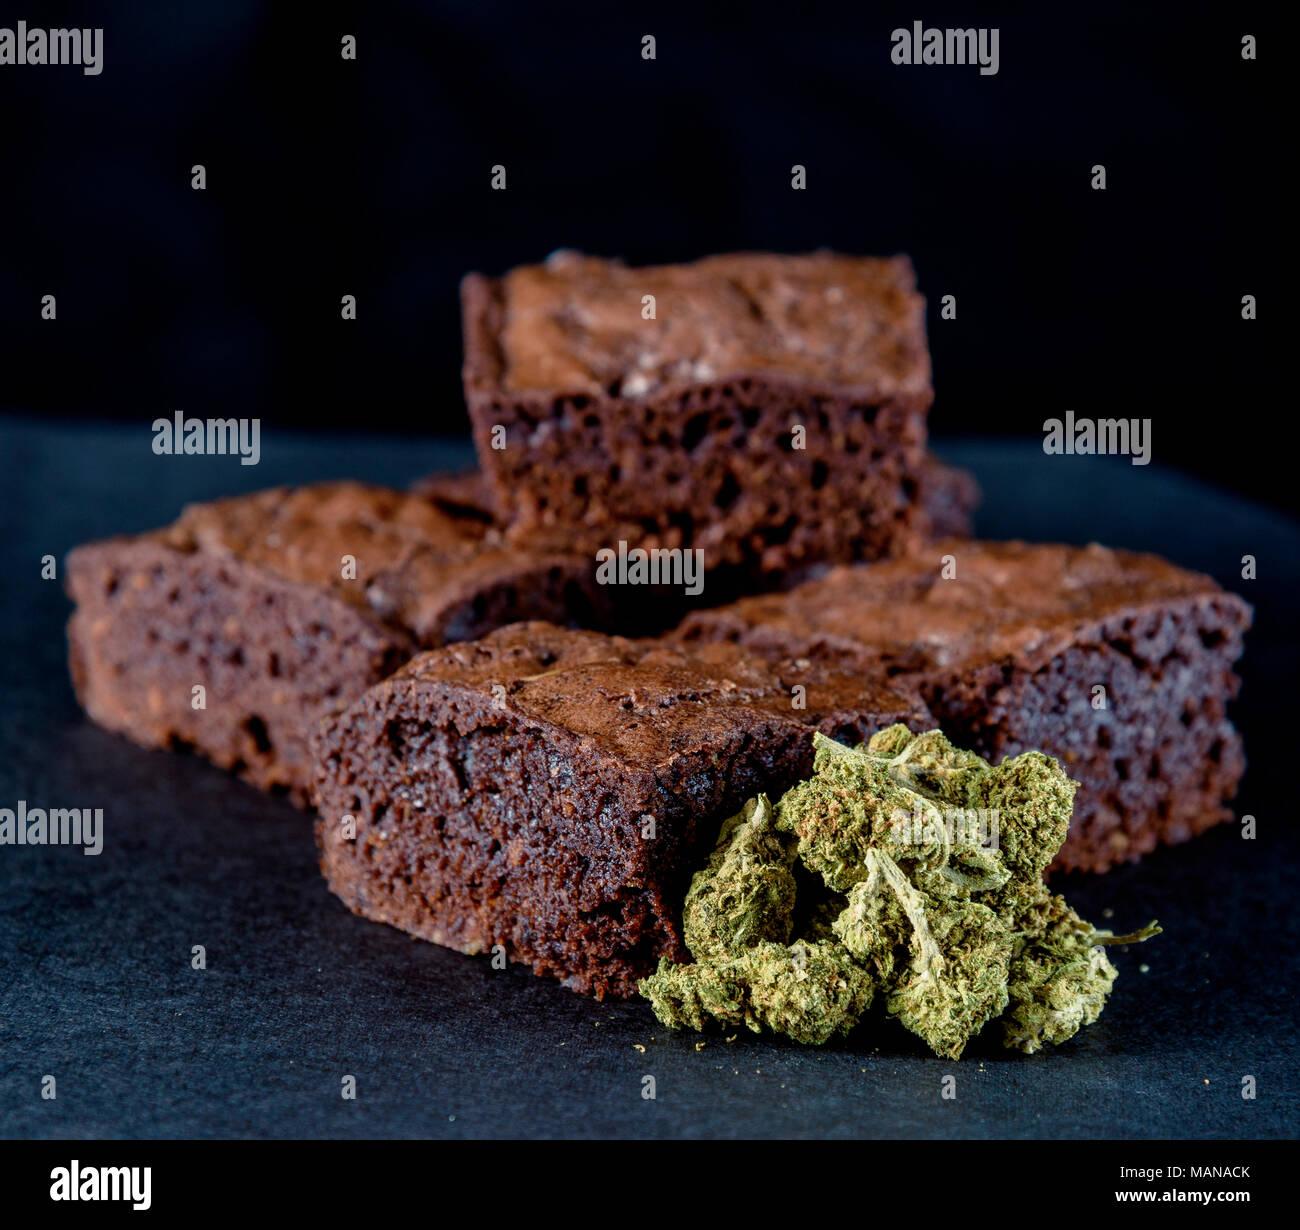 A stack of marijuana edible brownies next to a small pile of medical marijuana nugs. Black background - Stock Image